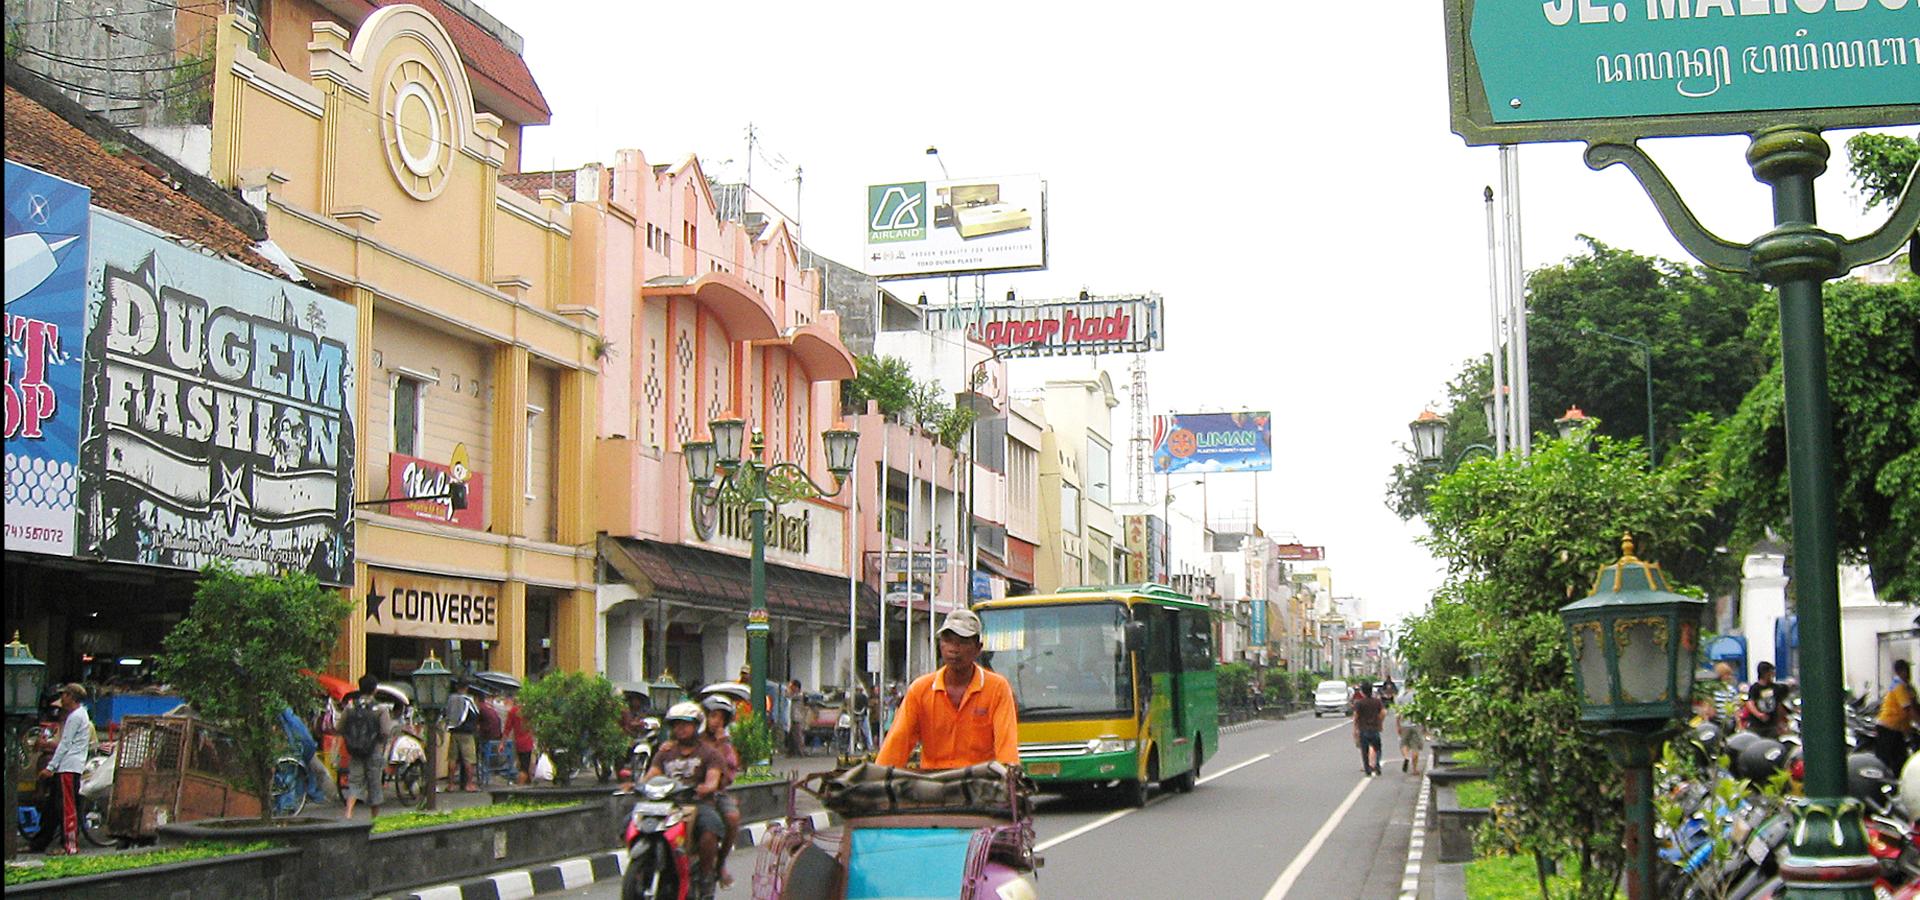 Peer-to-peer advisory in Yogyakarta, Indonesia